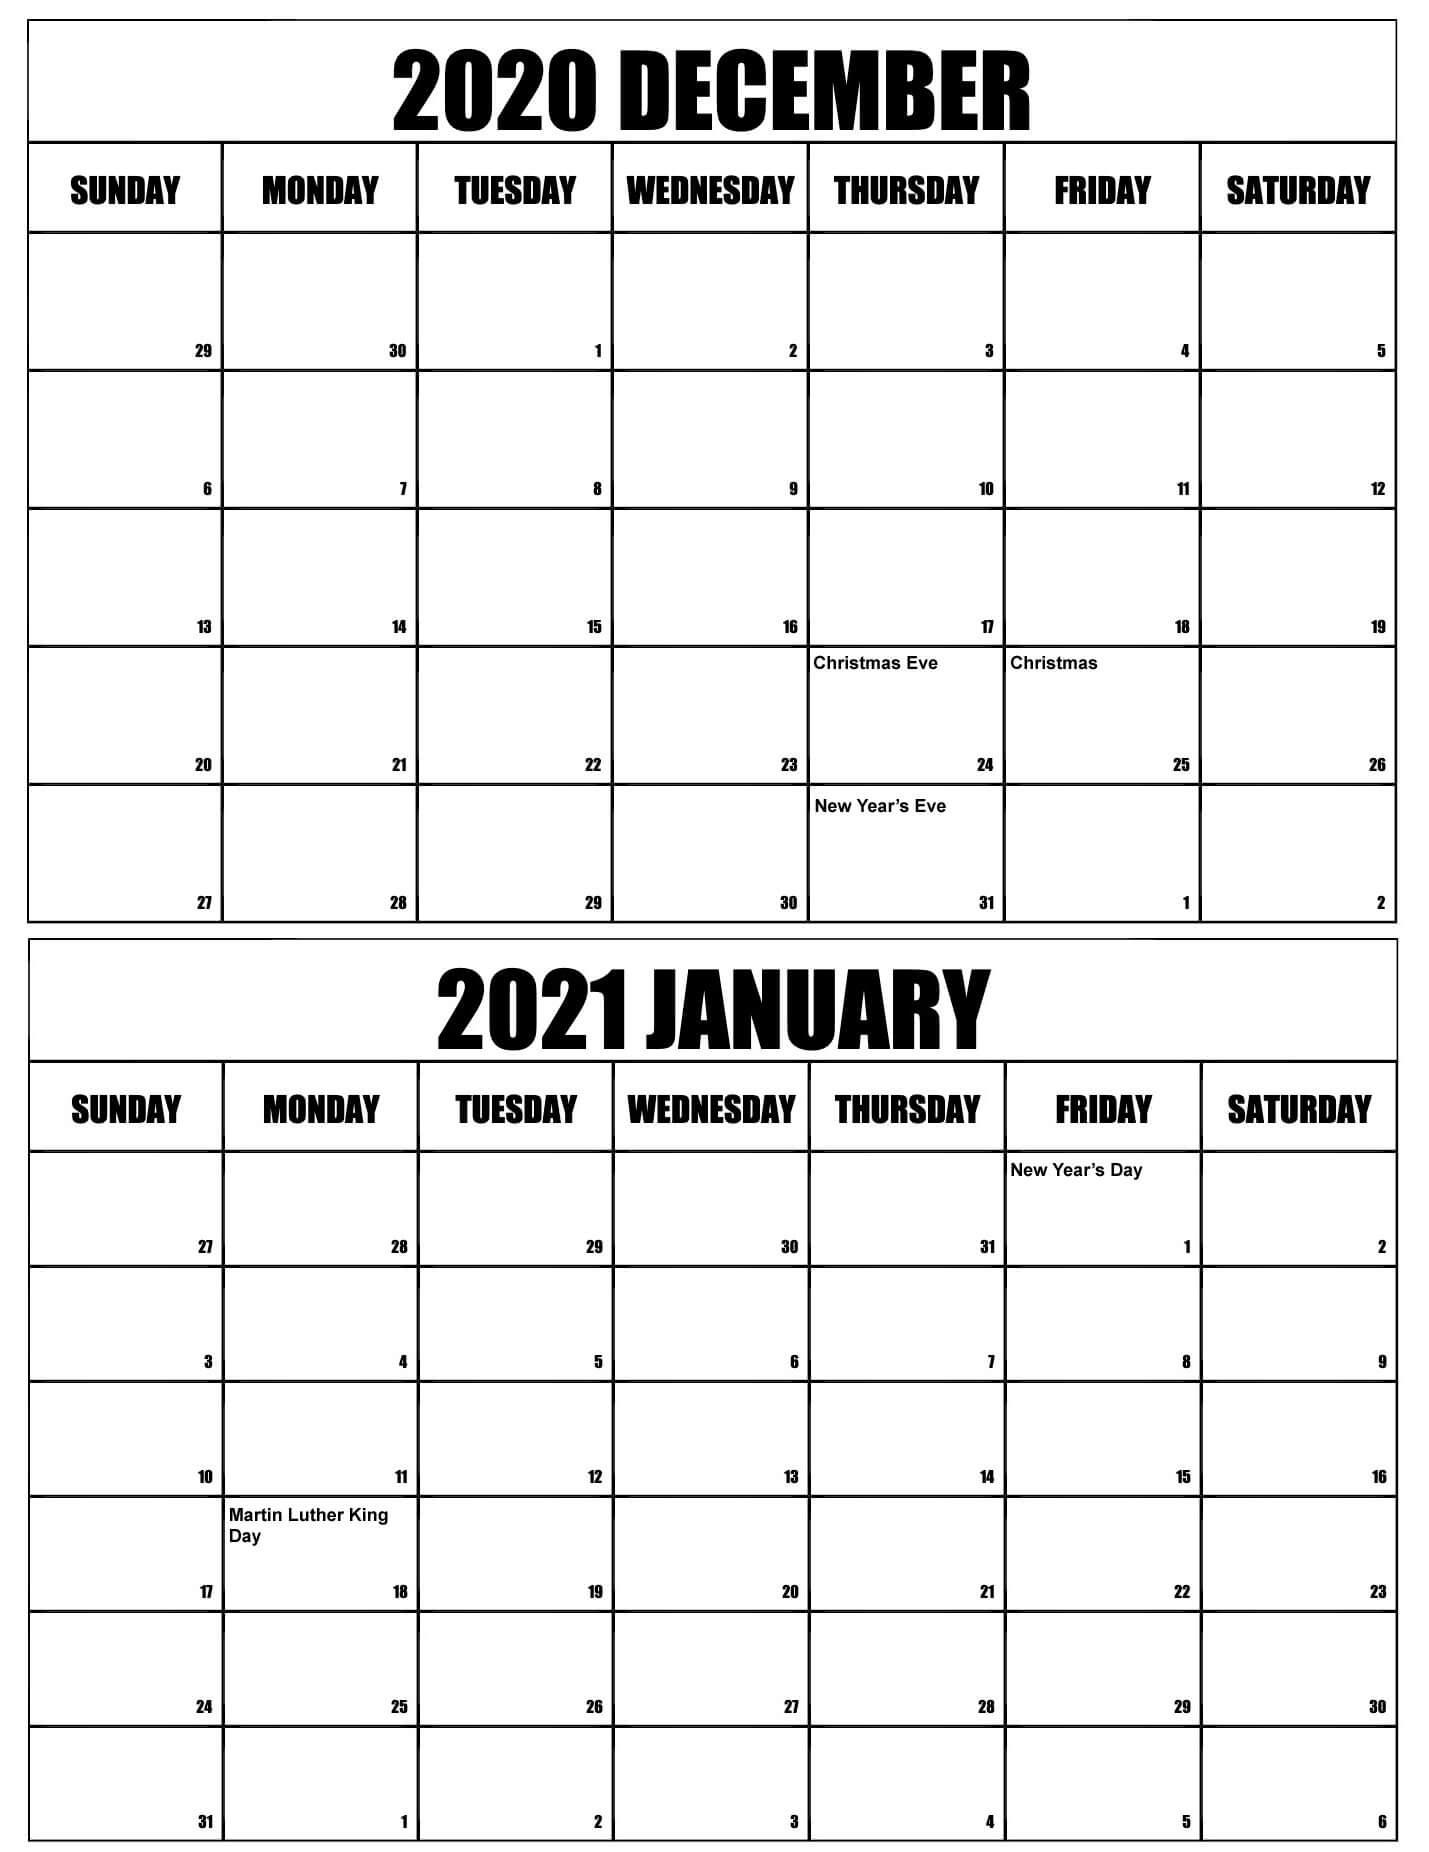 December 2020 January 2021 Calendar Word   Free Printable Calendar Shop Printable January Through December 2021 Calendar